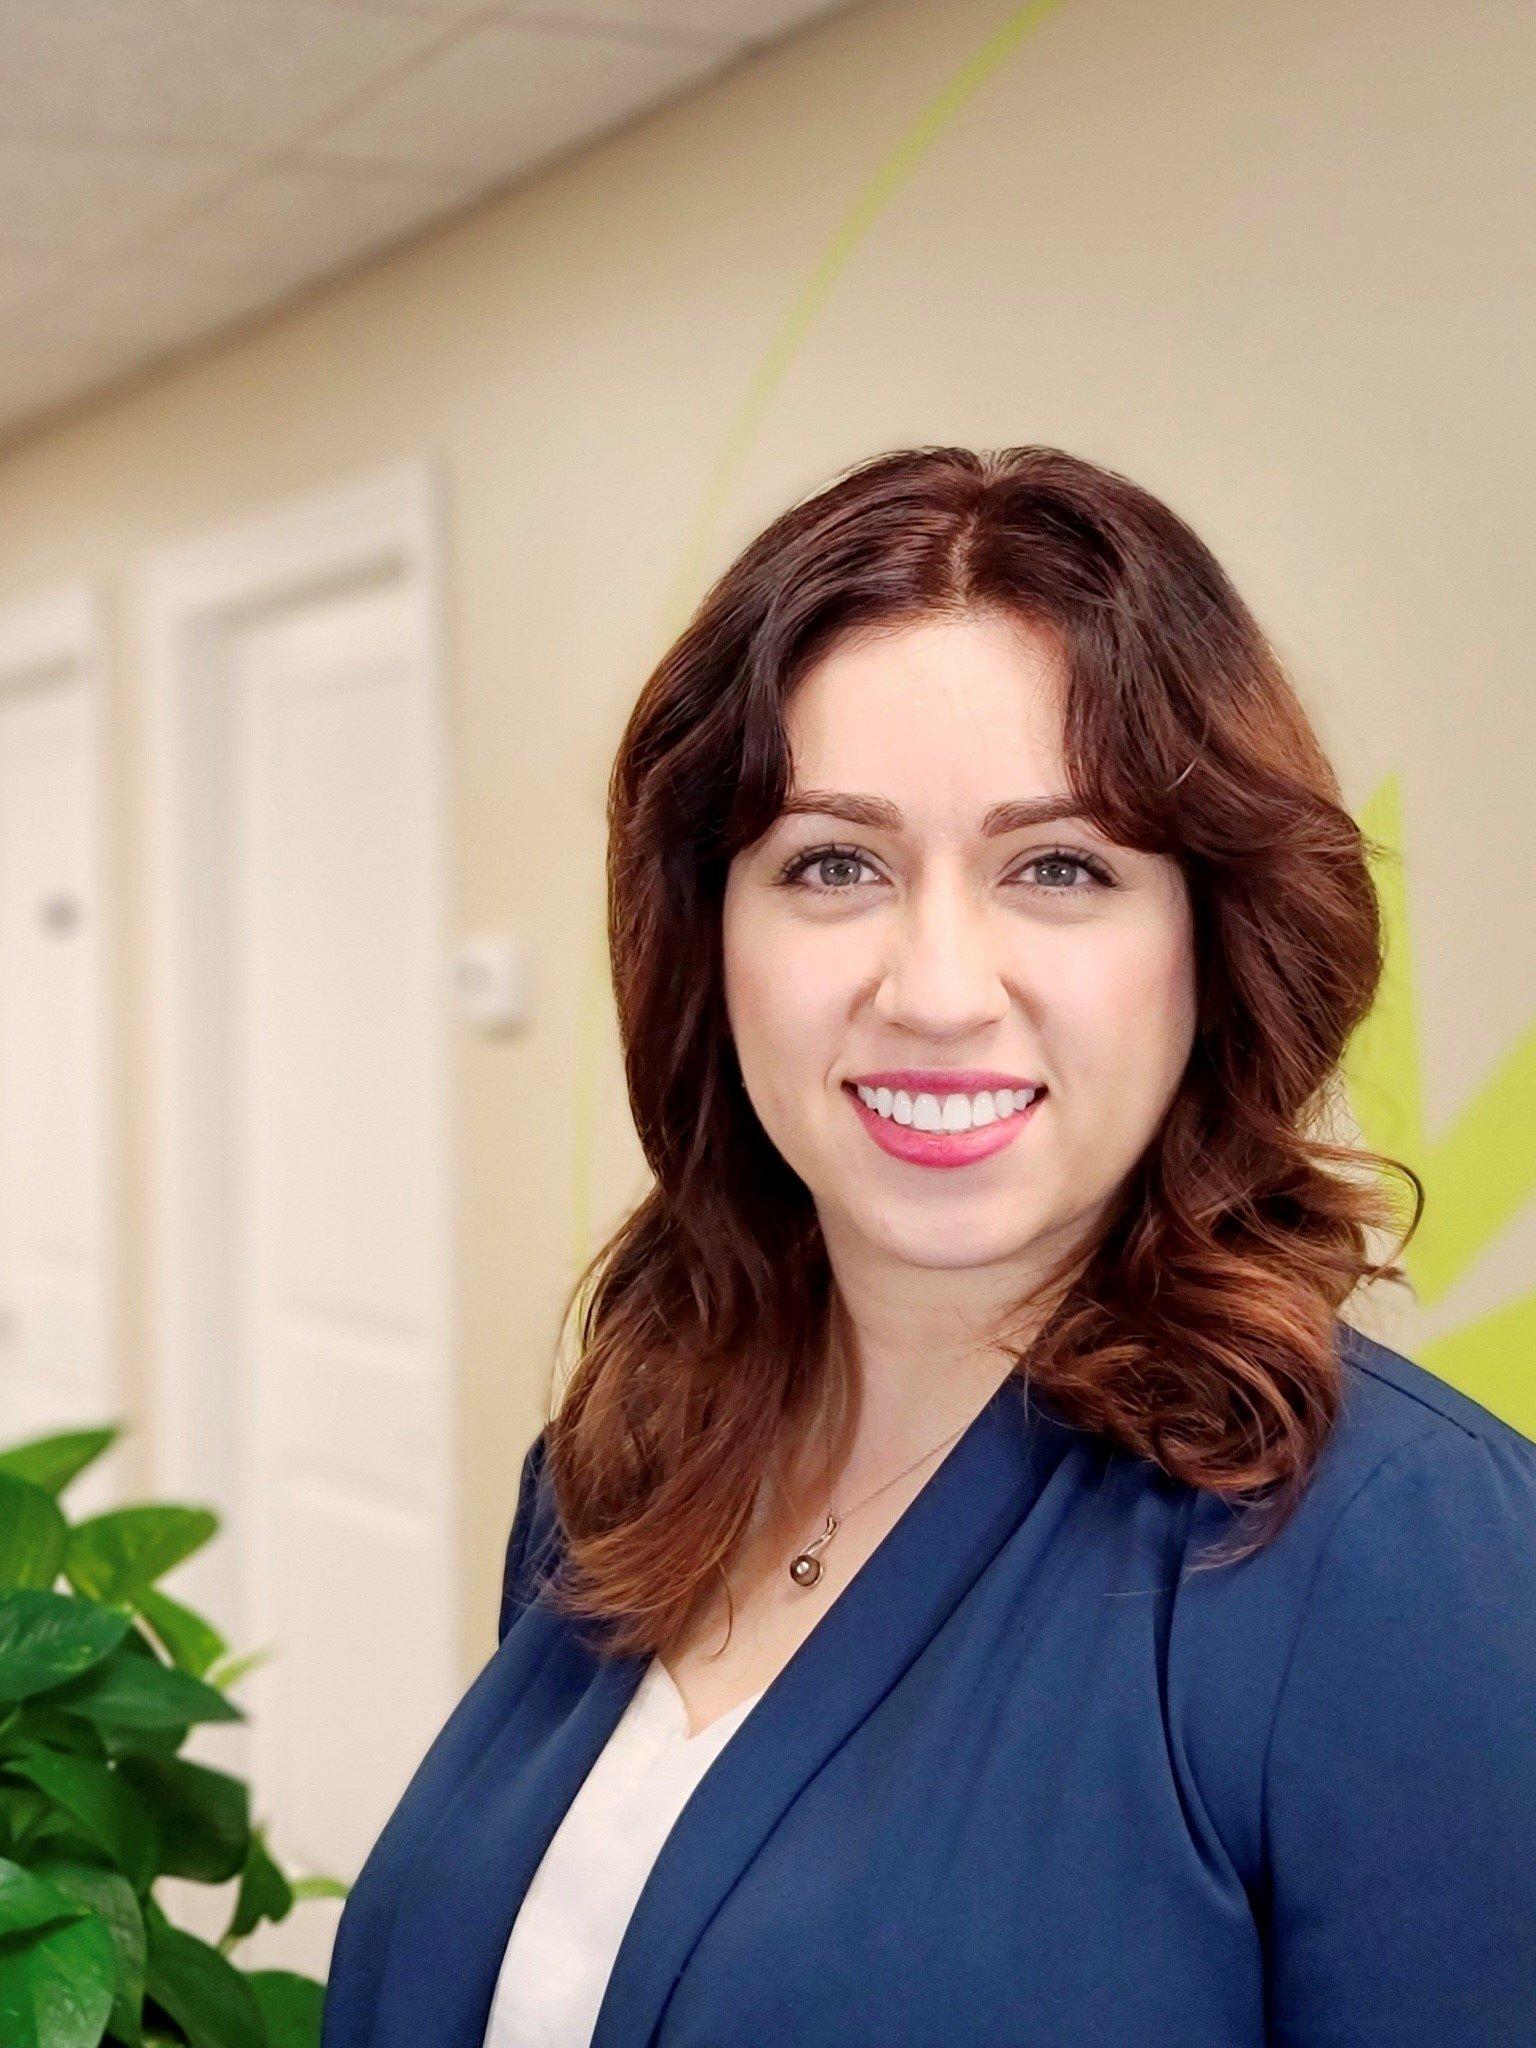 Marketing manager HighPoint Advisors Sarah M. Flick